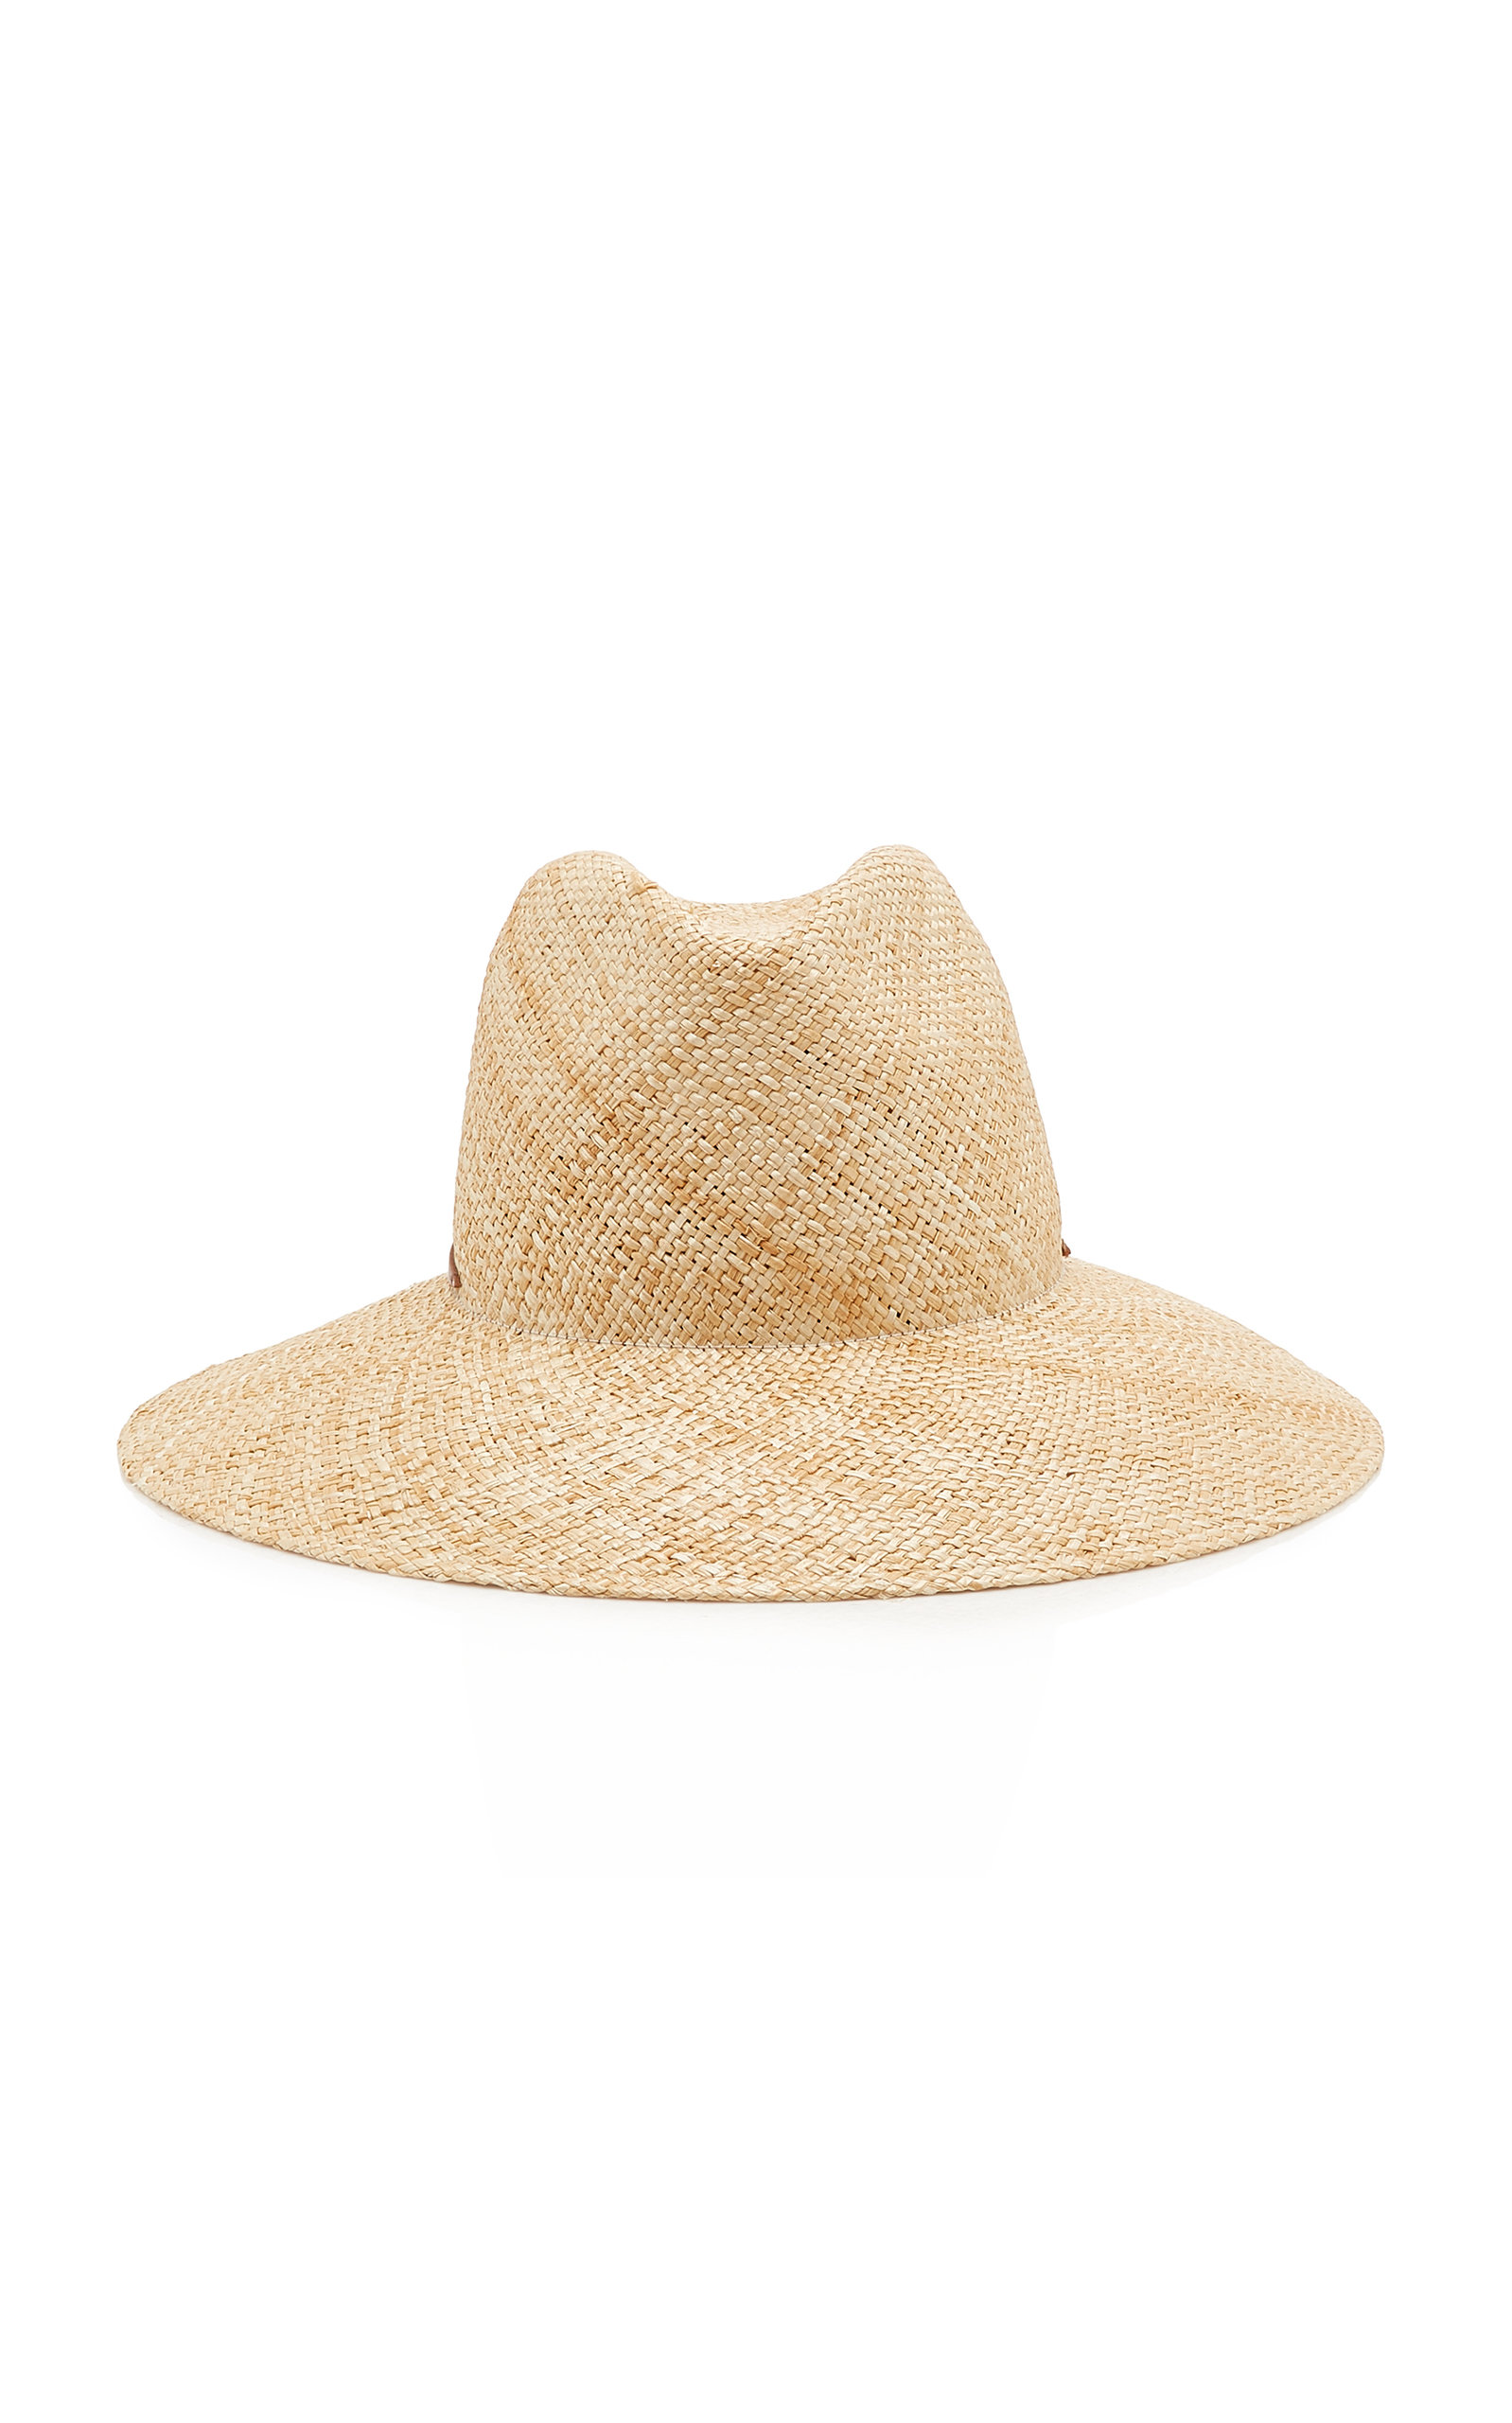 Women's Bess Straw Hat